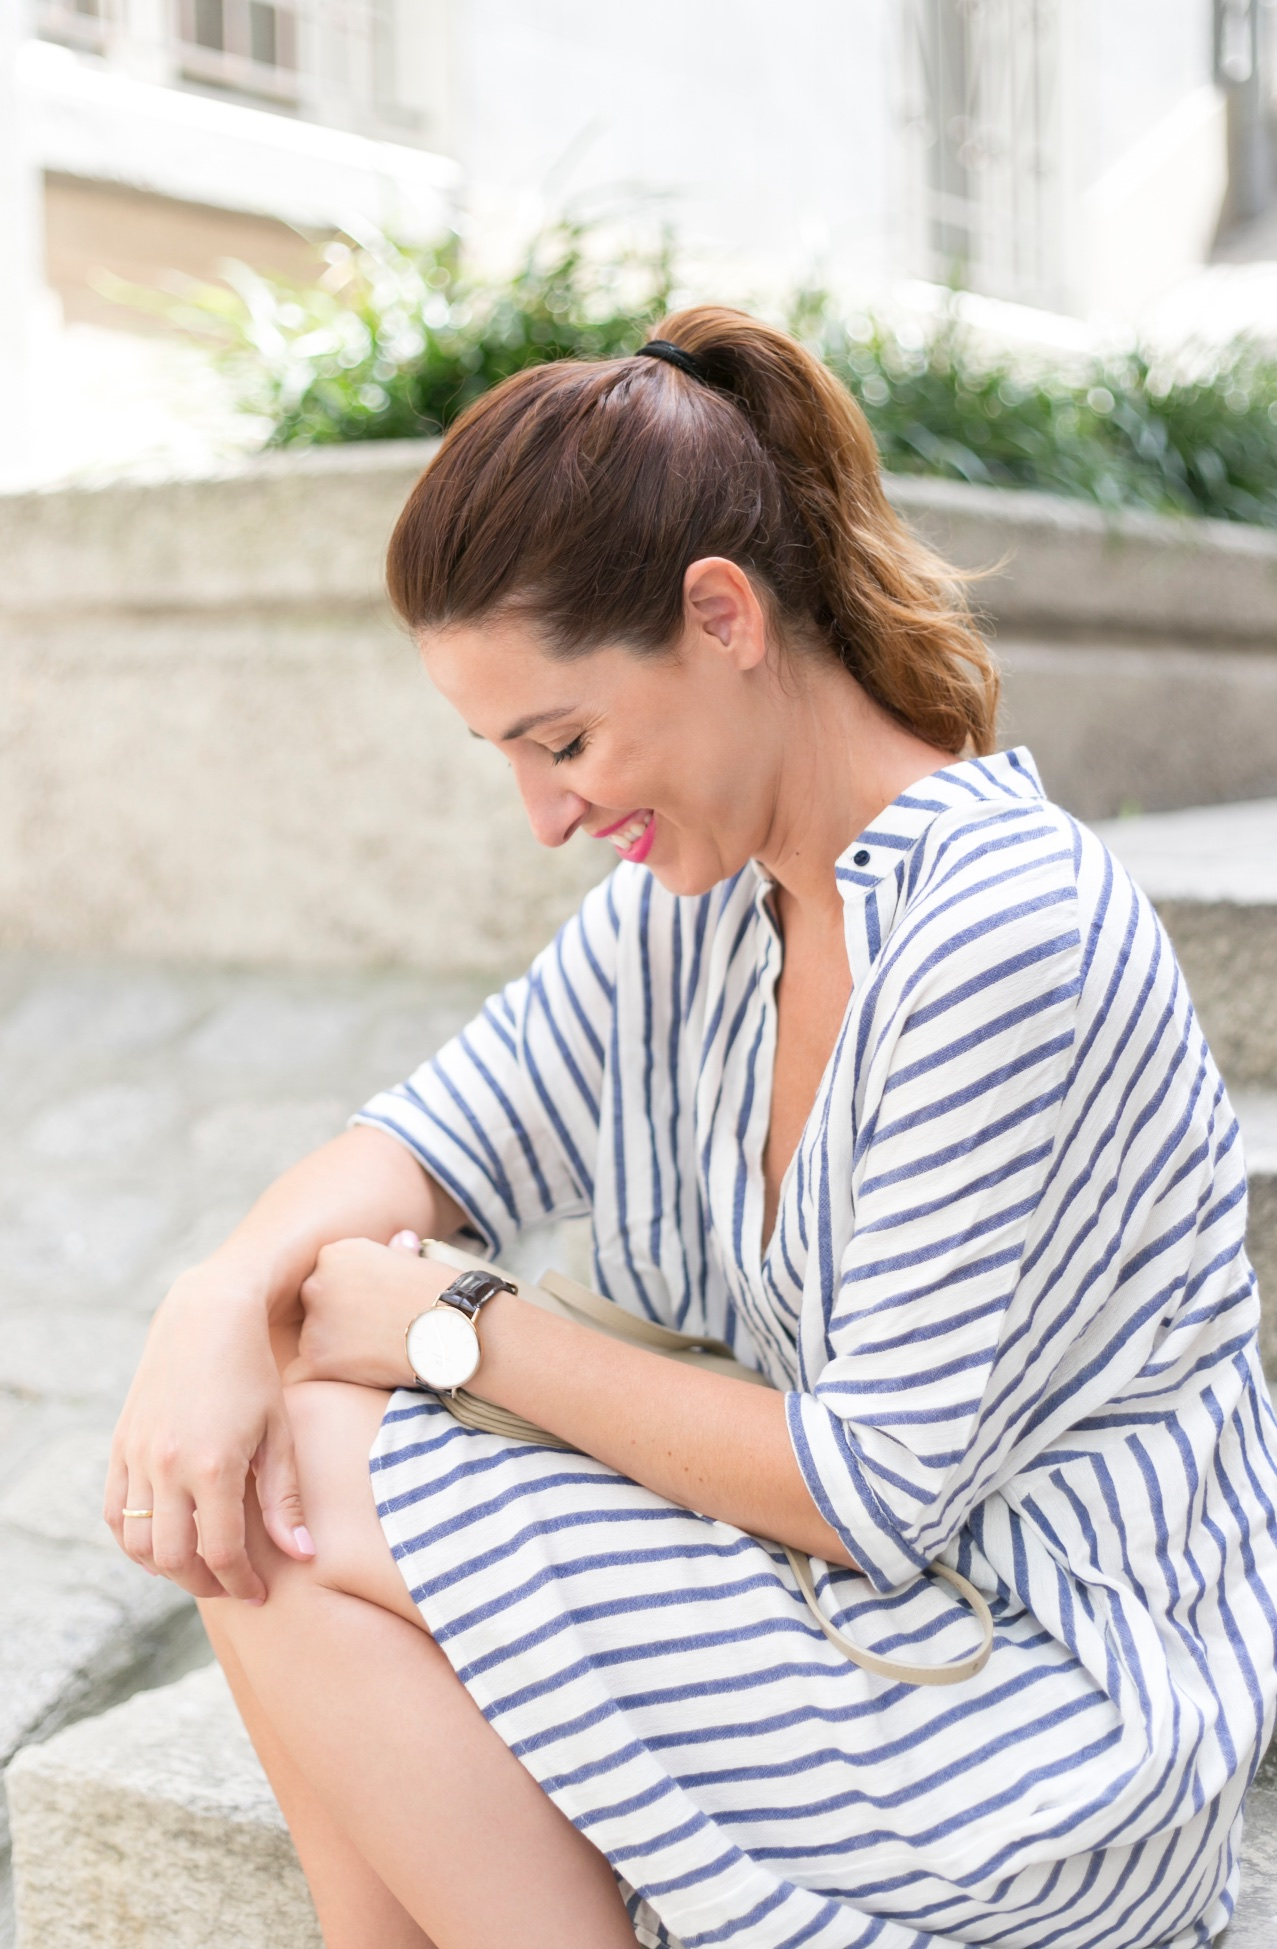 DanielWellington-descalzaporelparque-fashion-mommyblogger-treetstyle-stripes-watch